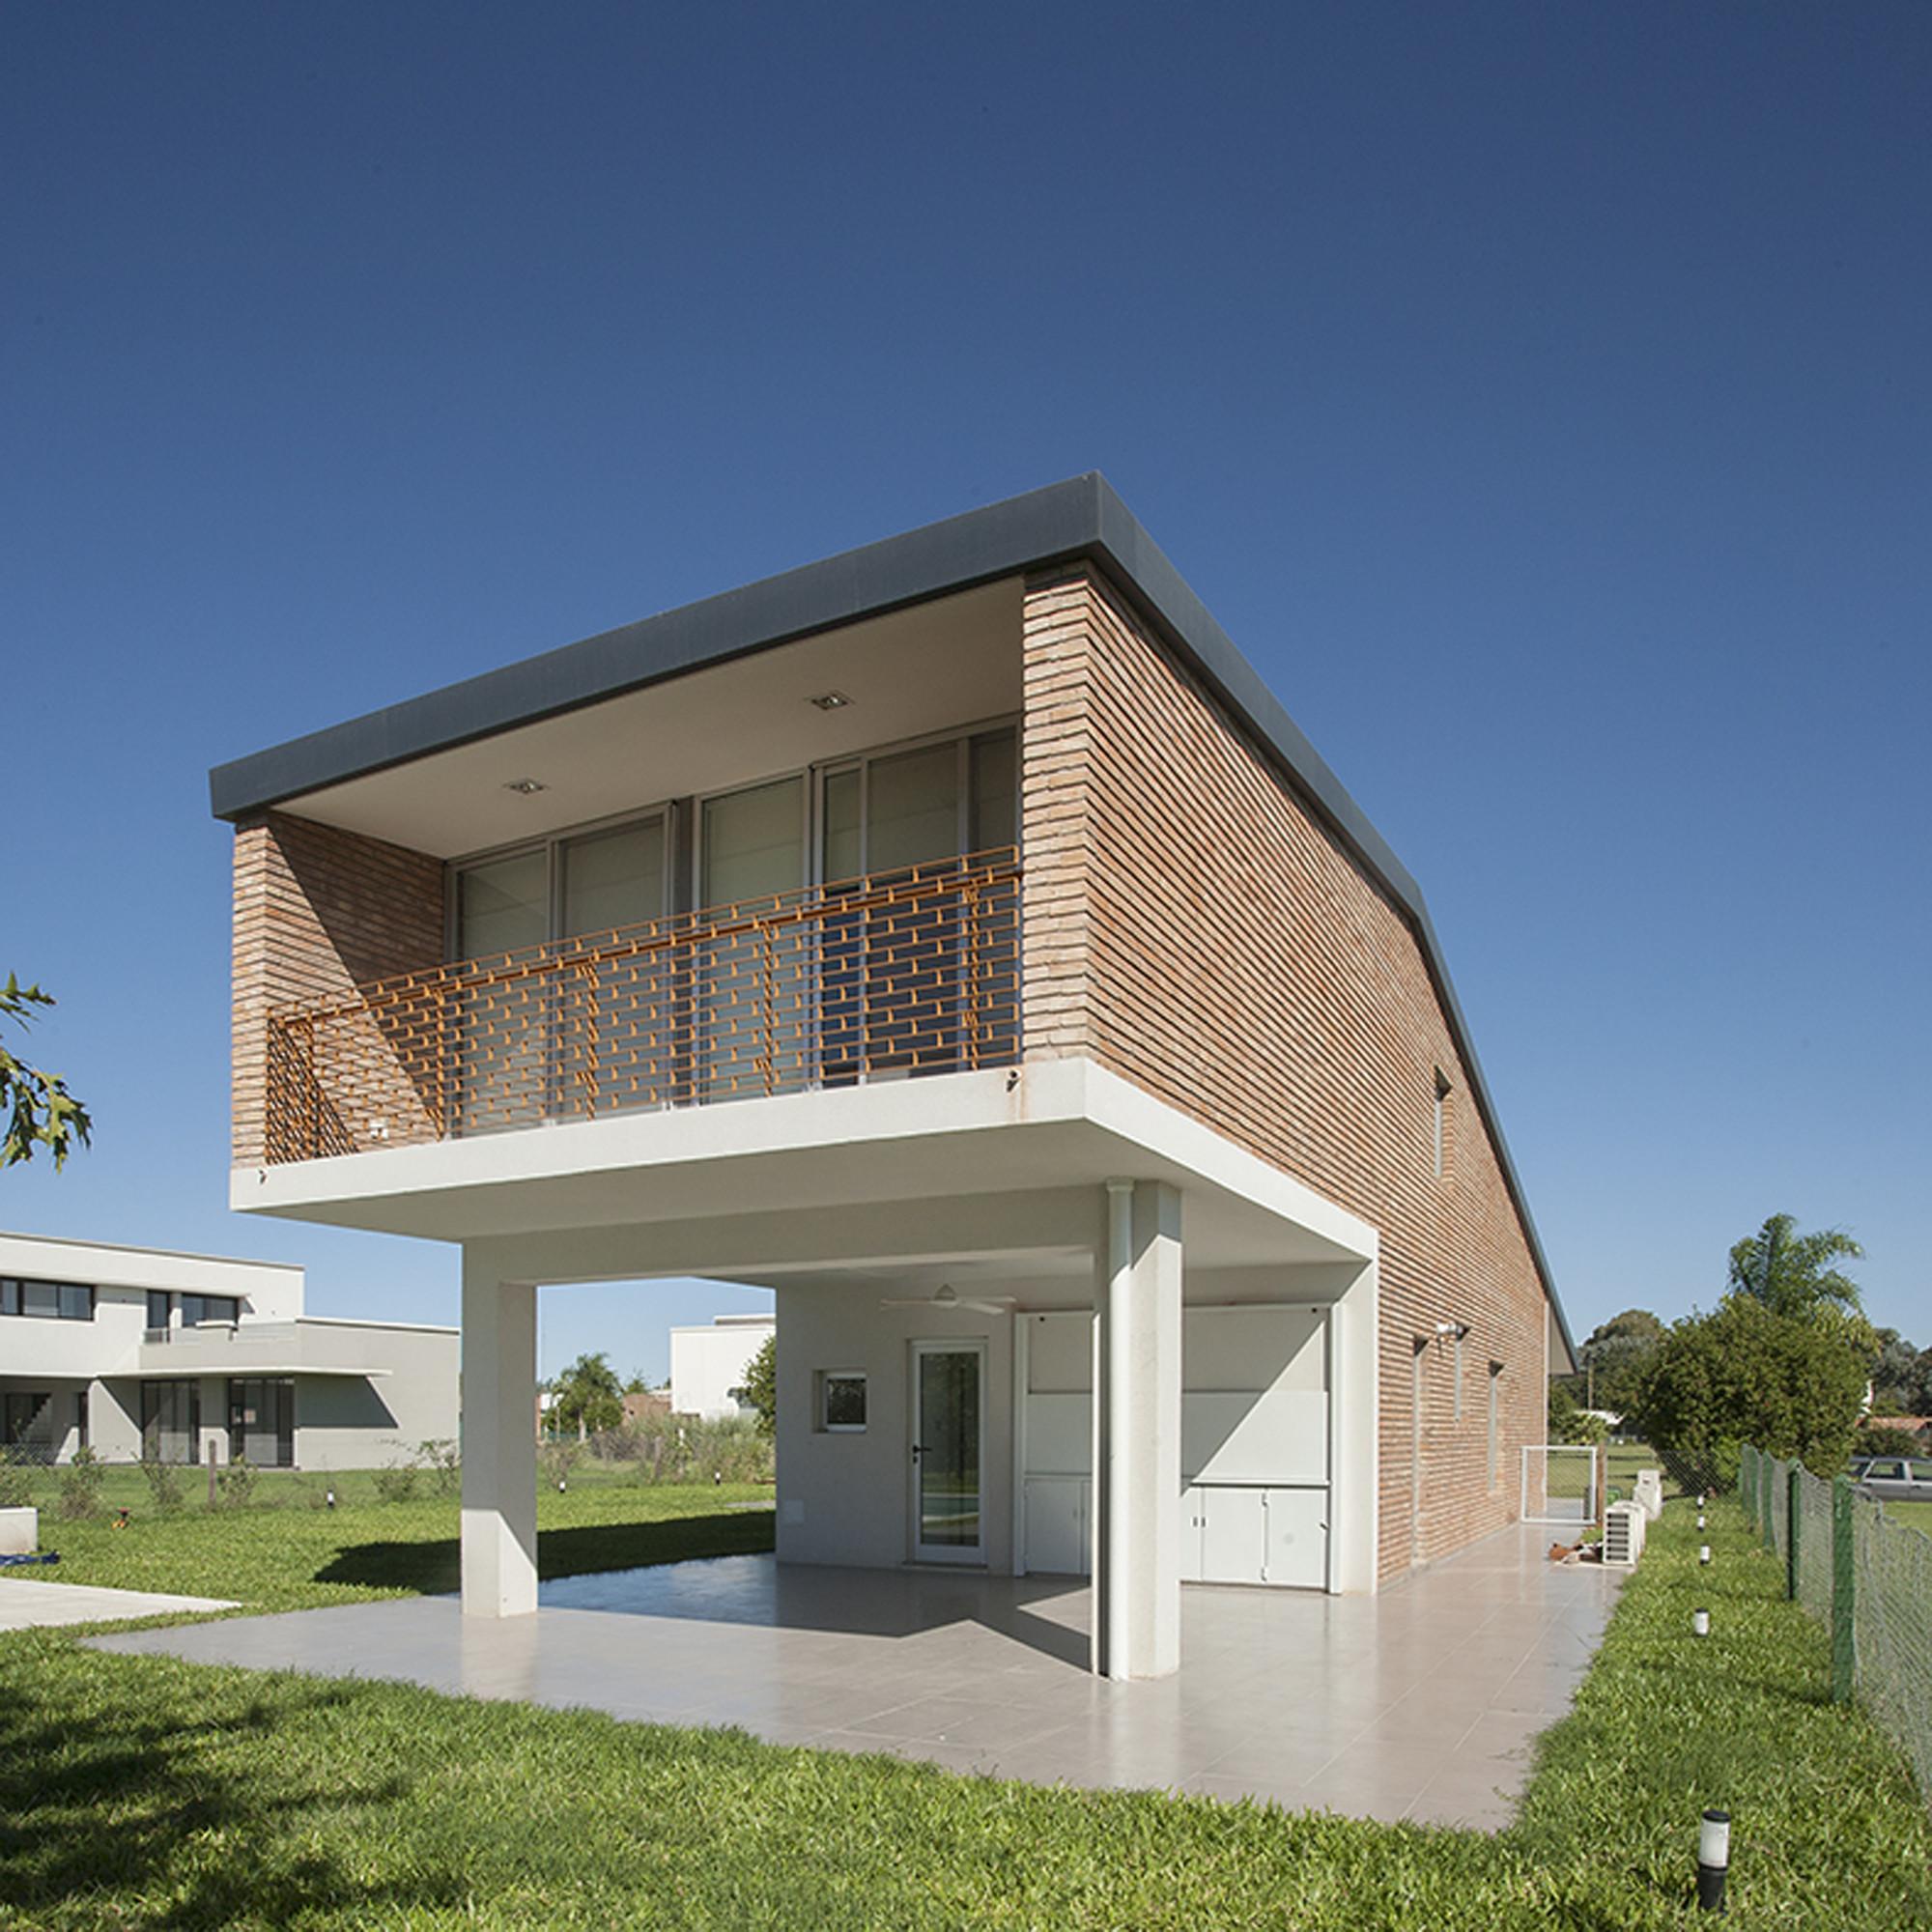 Miraflores House / Gerardo Caballero Maite Fernandez Arquitectos, © Gustavo Frittegotto